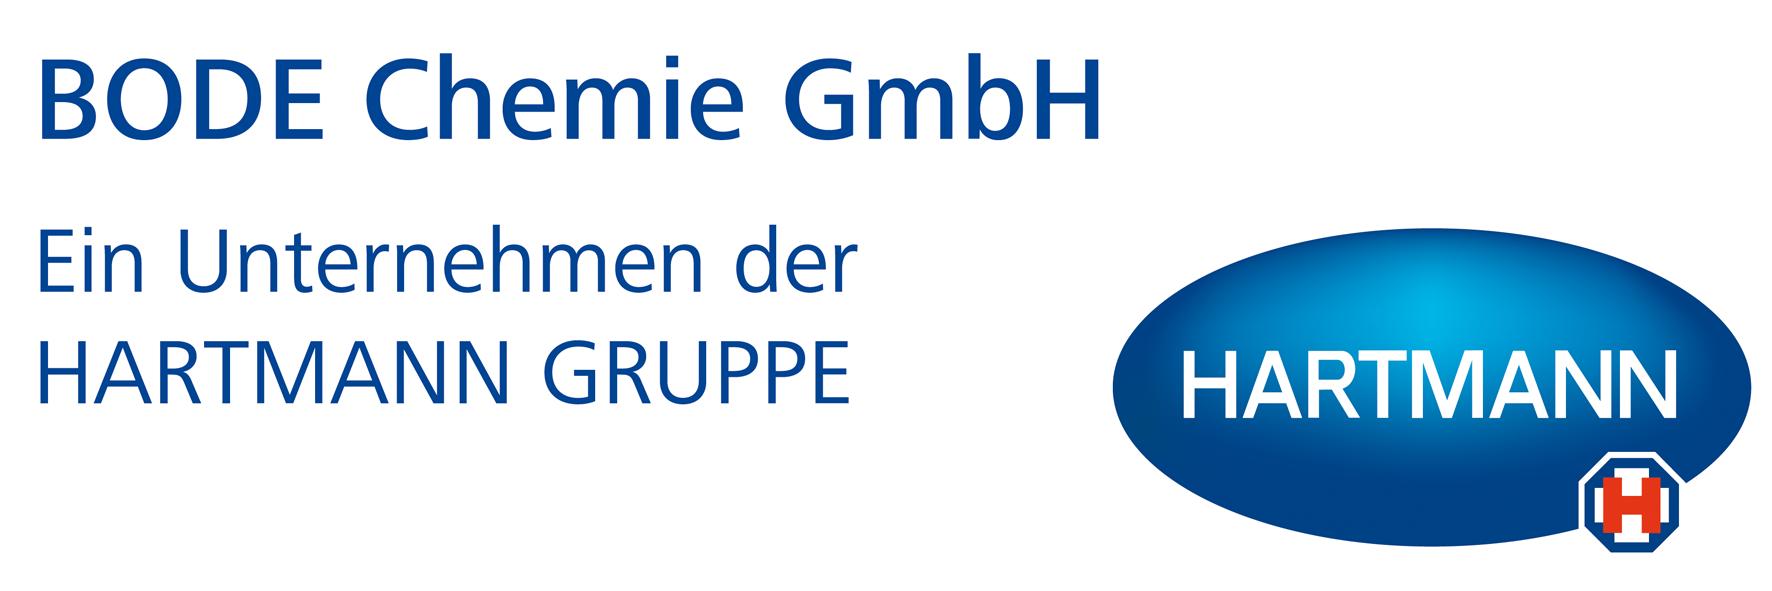 Logo_BODE_Chemie